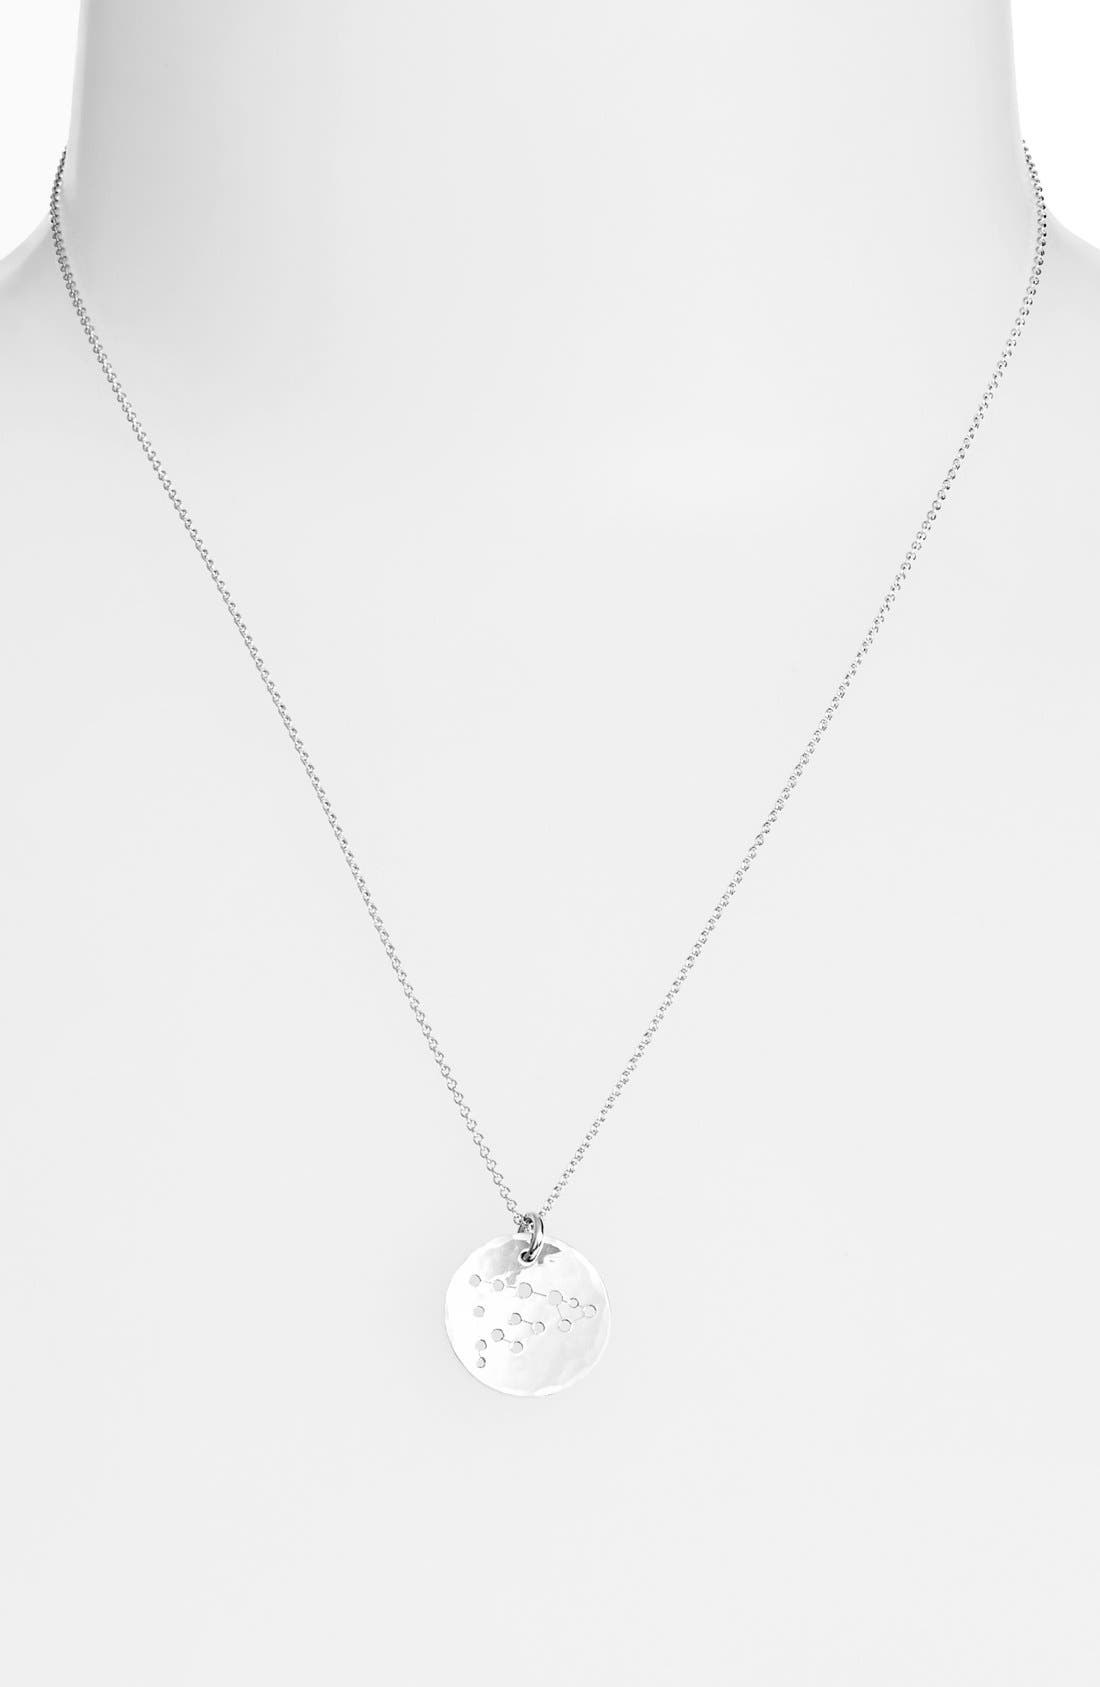 Ija 'Small Zodiac' Sterling Silver Necklace